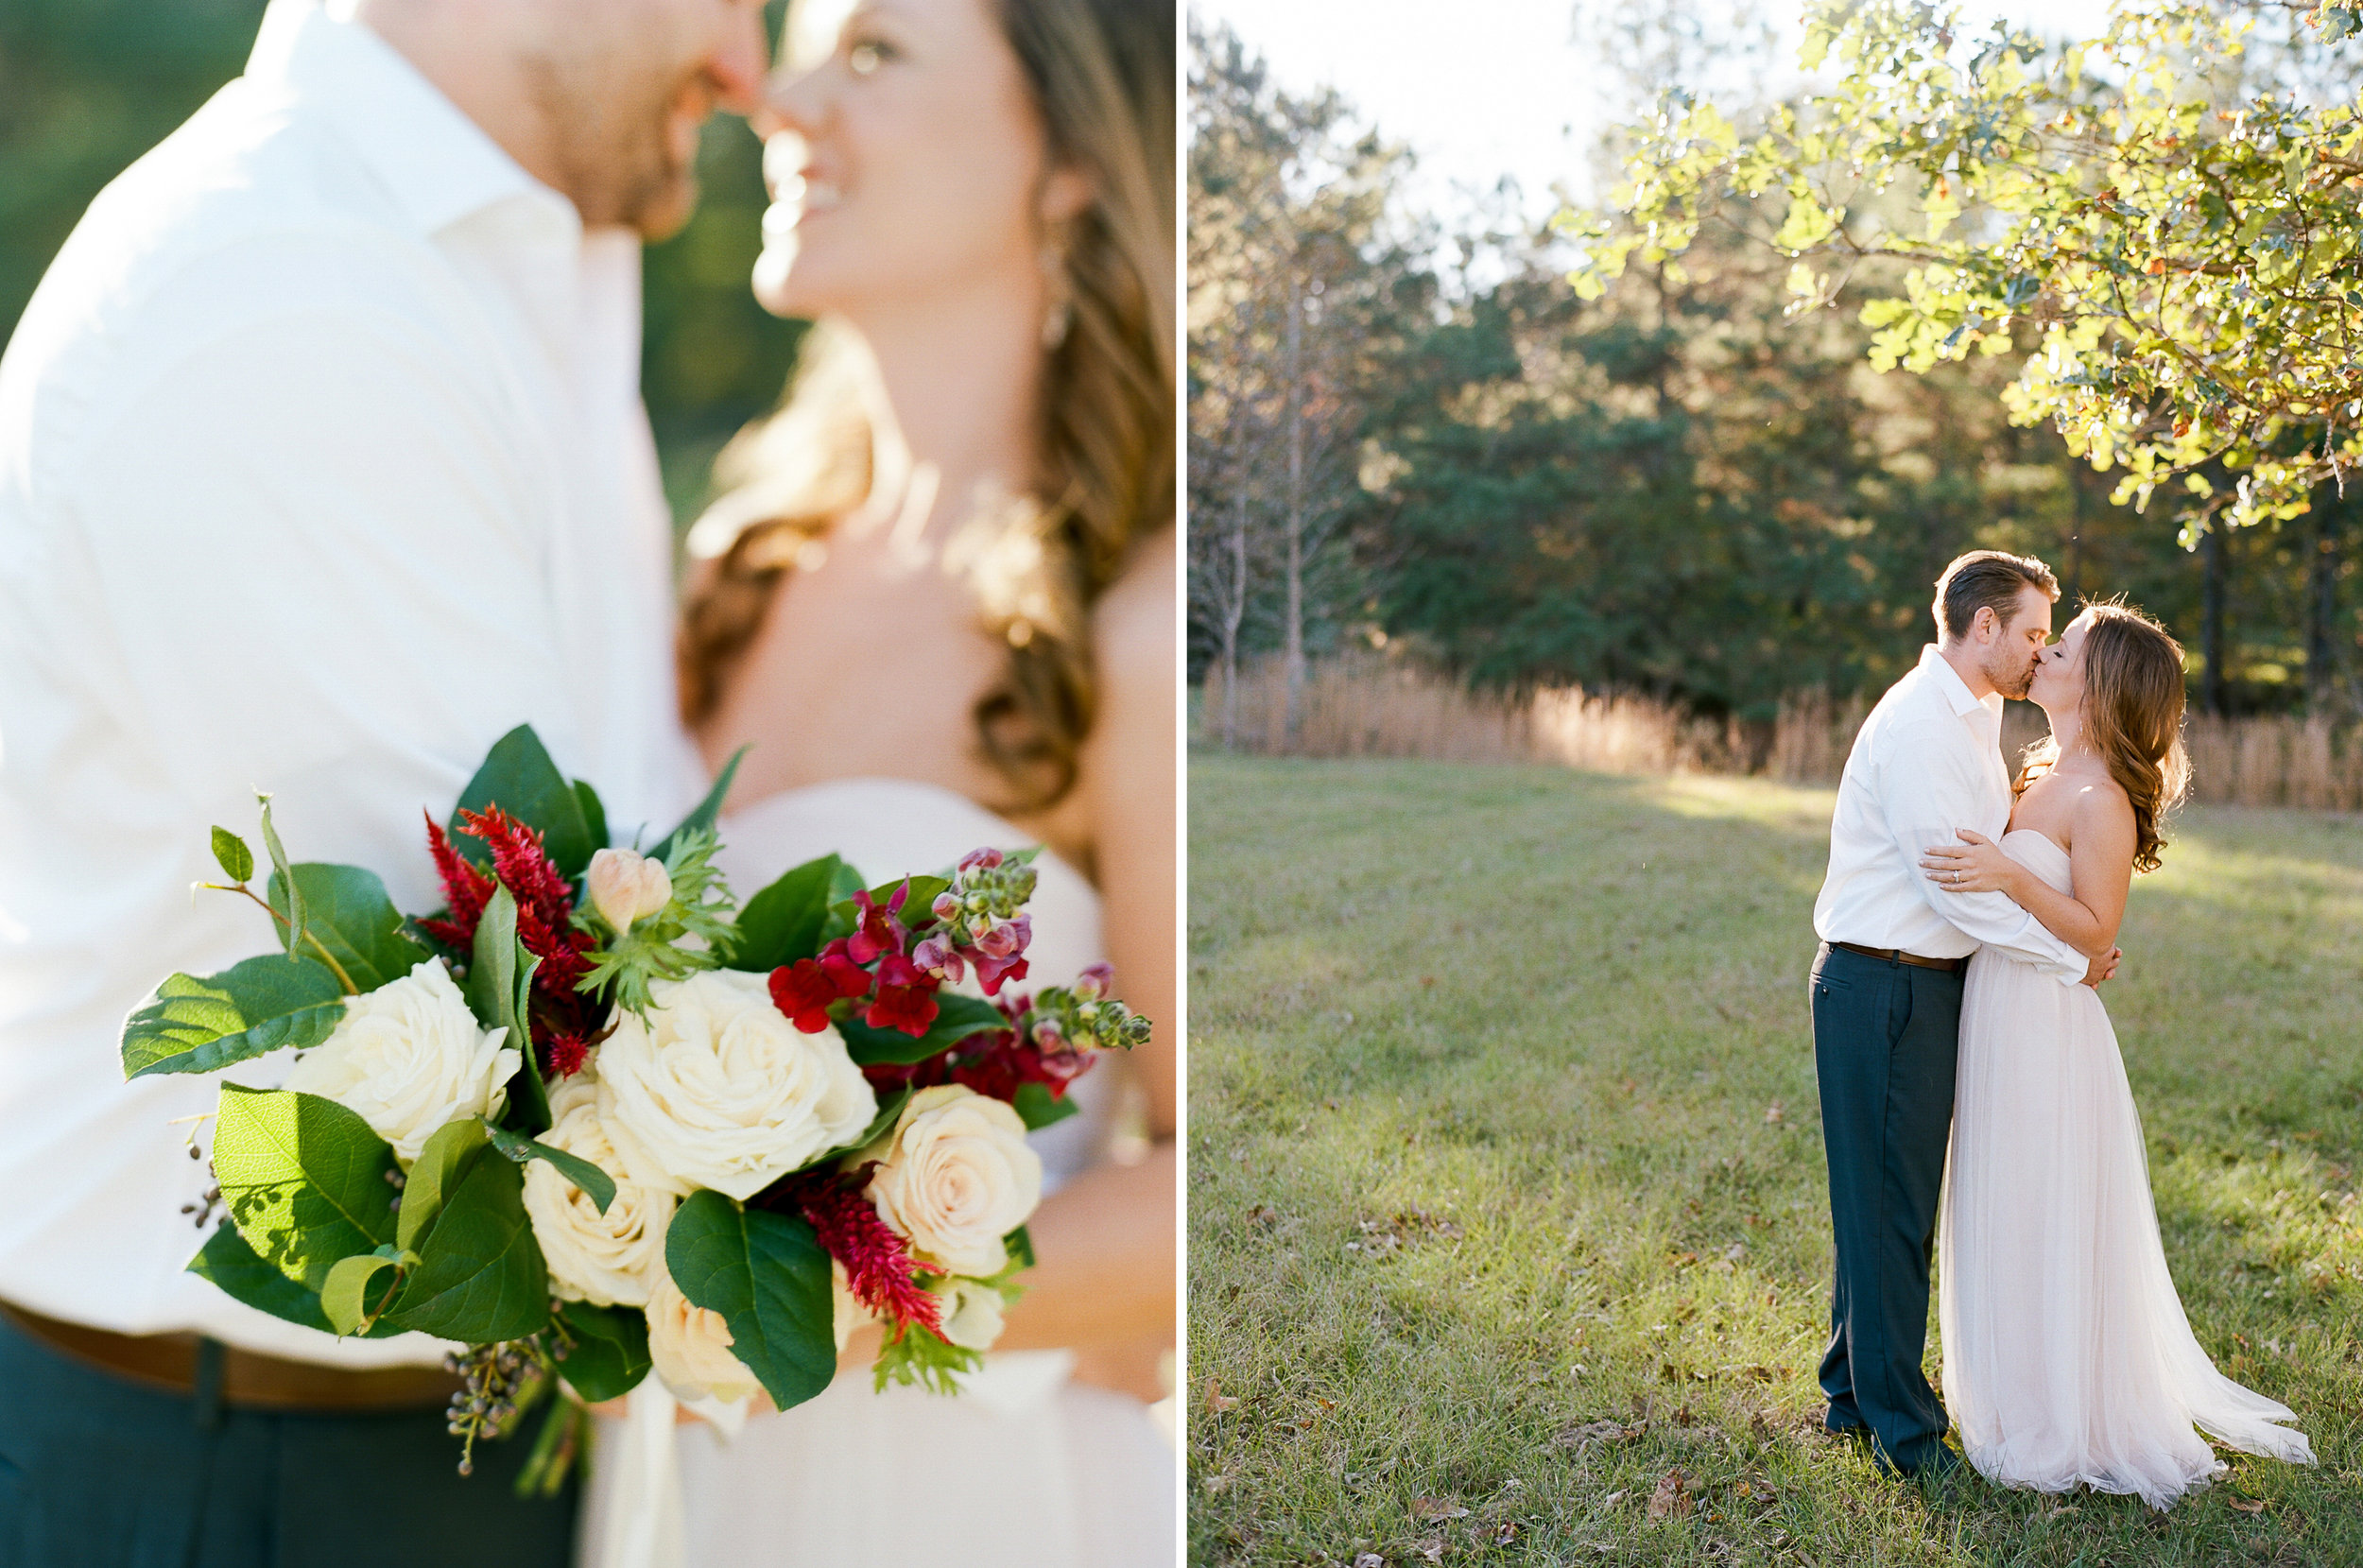 dana-fernandez-photography-houston-wedding-photographer-portraits-engagements-anniversary-session-film-photographer-austin-wedding-photographer-103.jpg